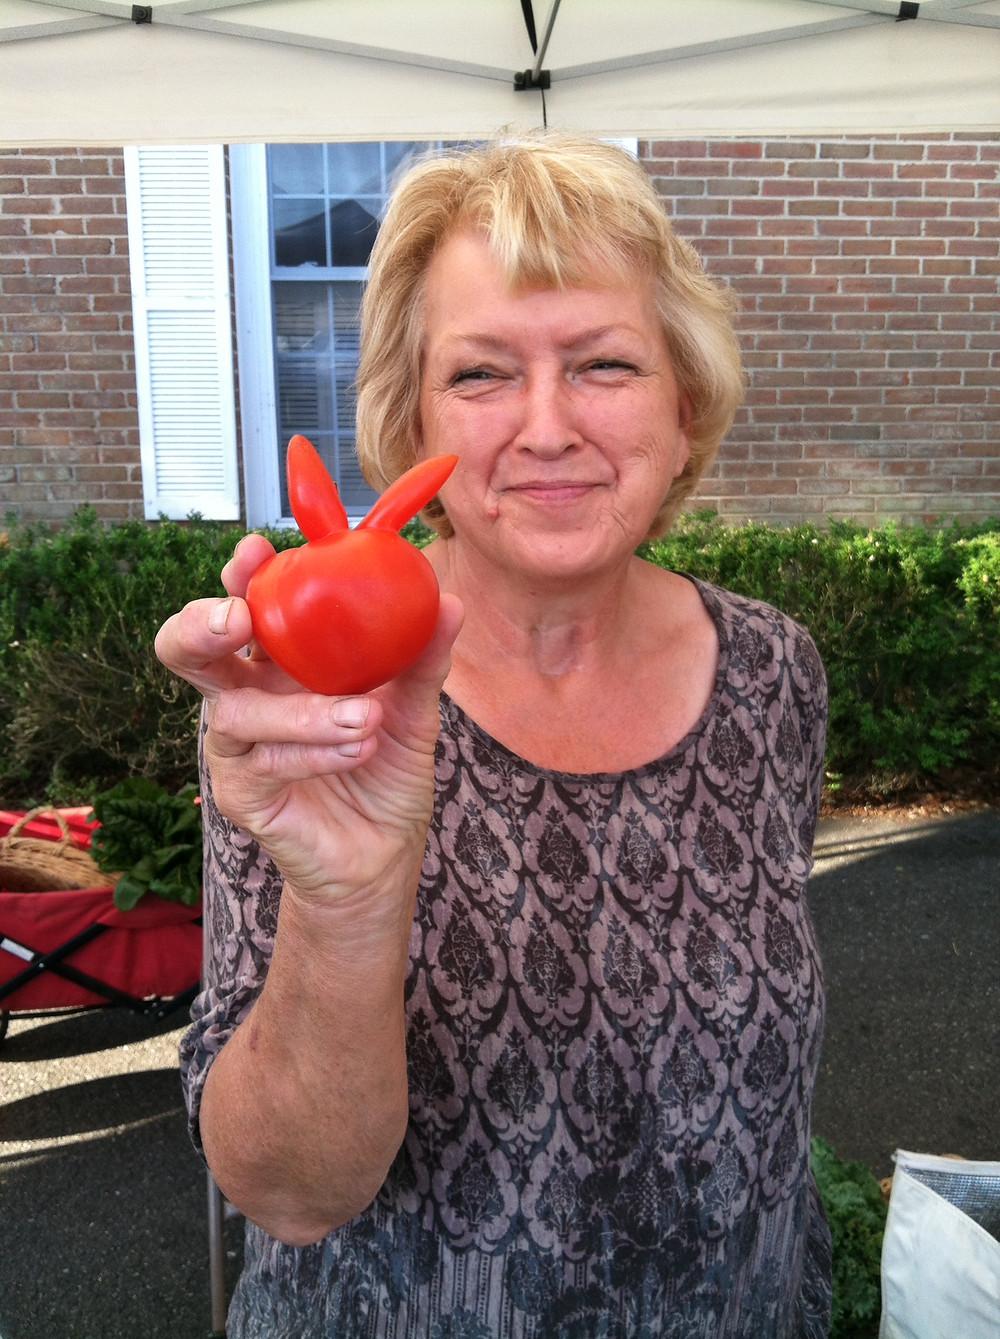 Bunny tomato